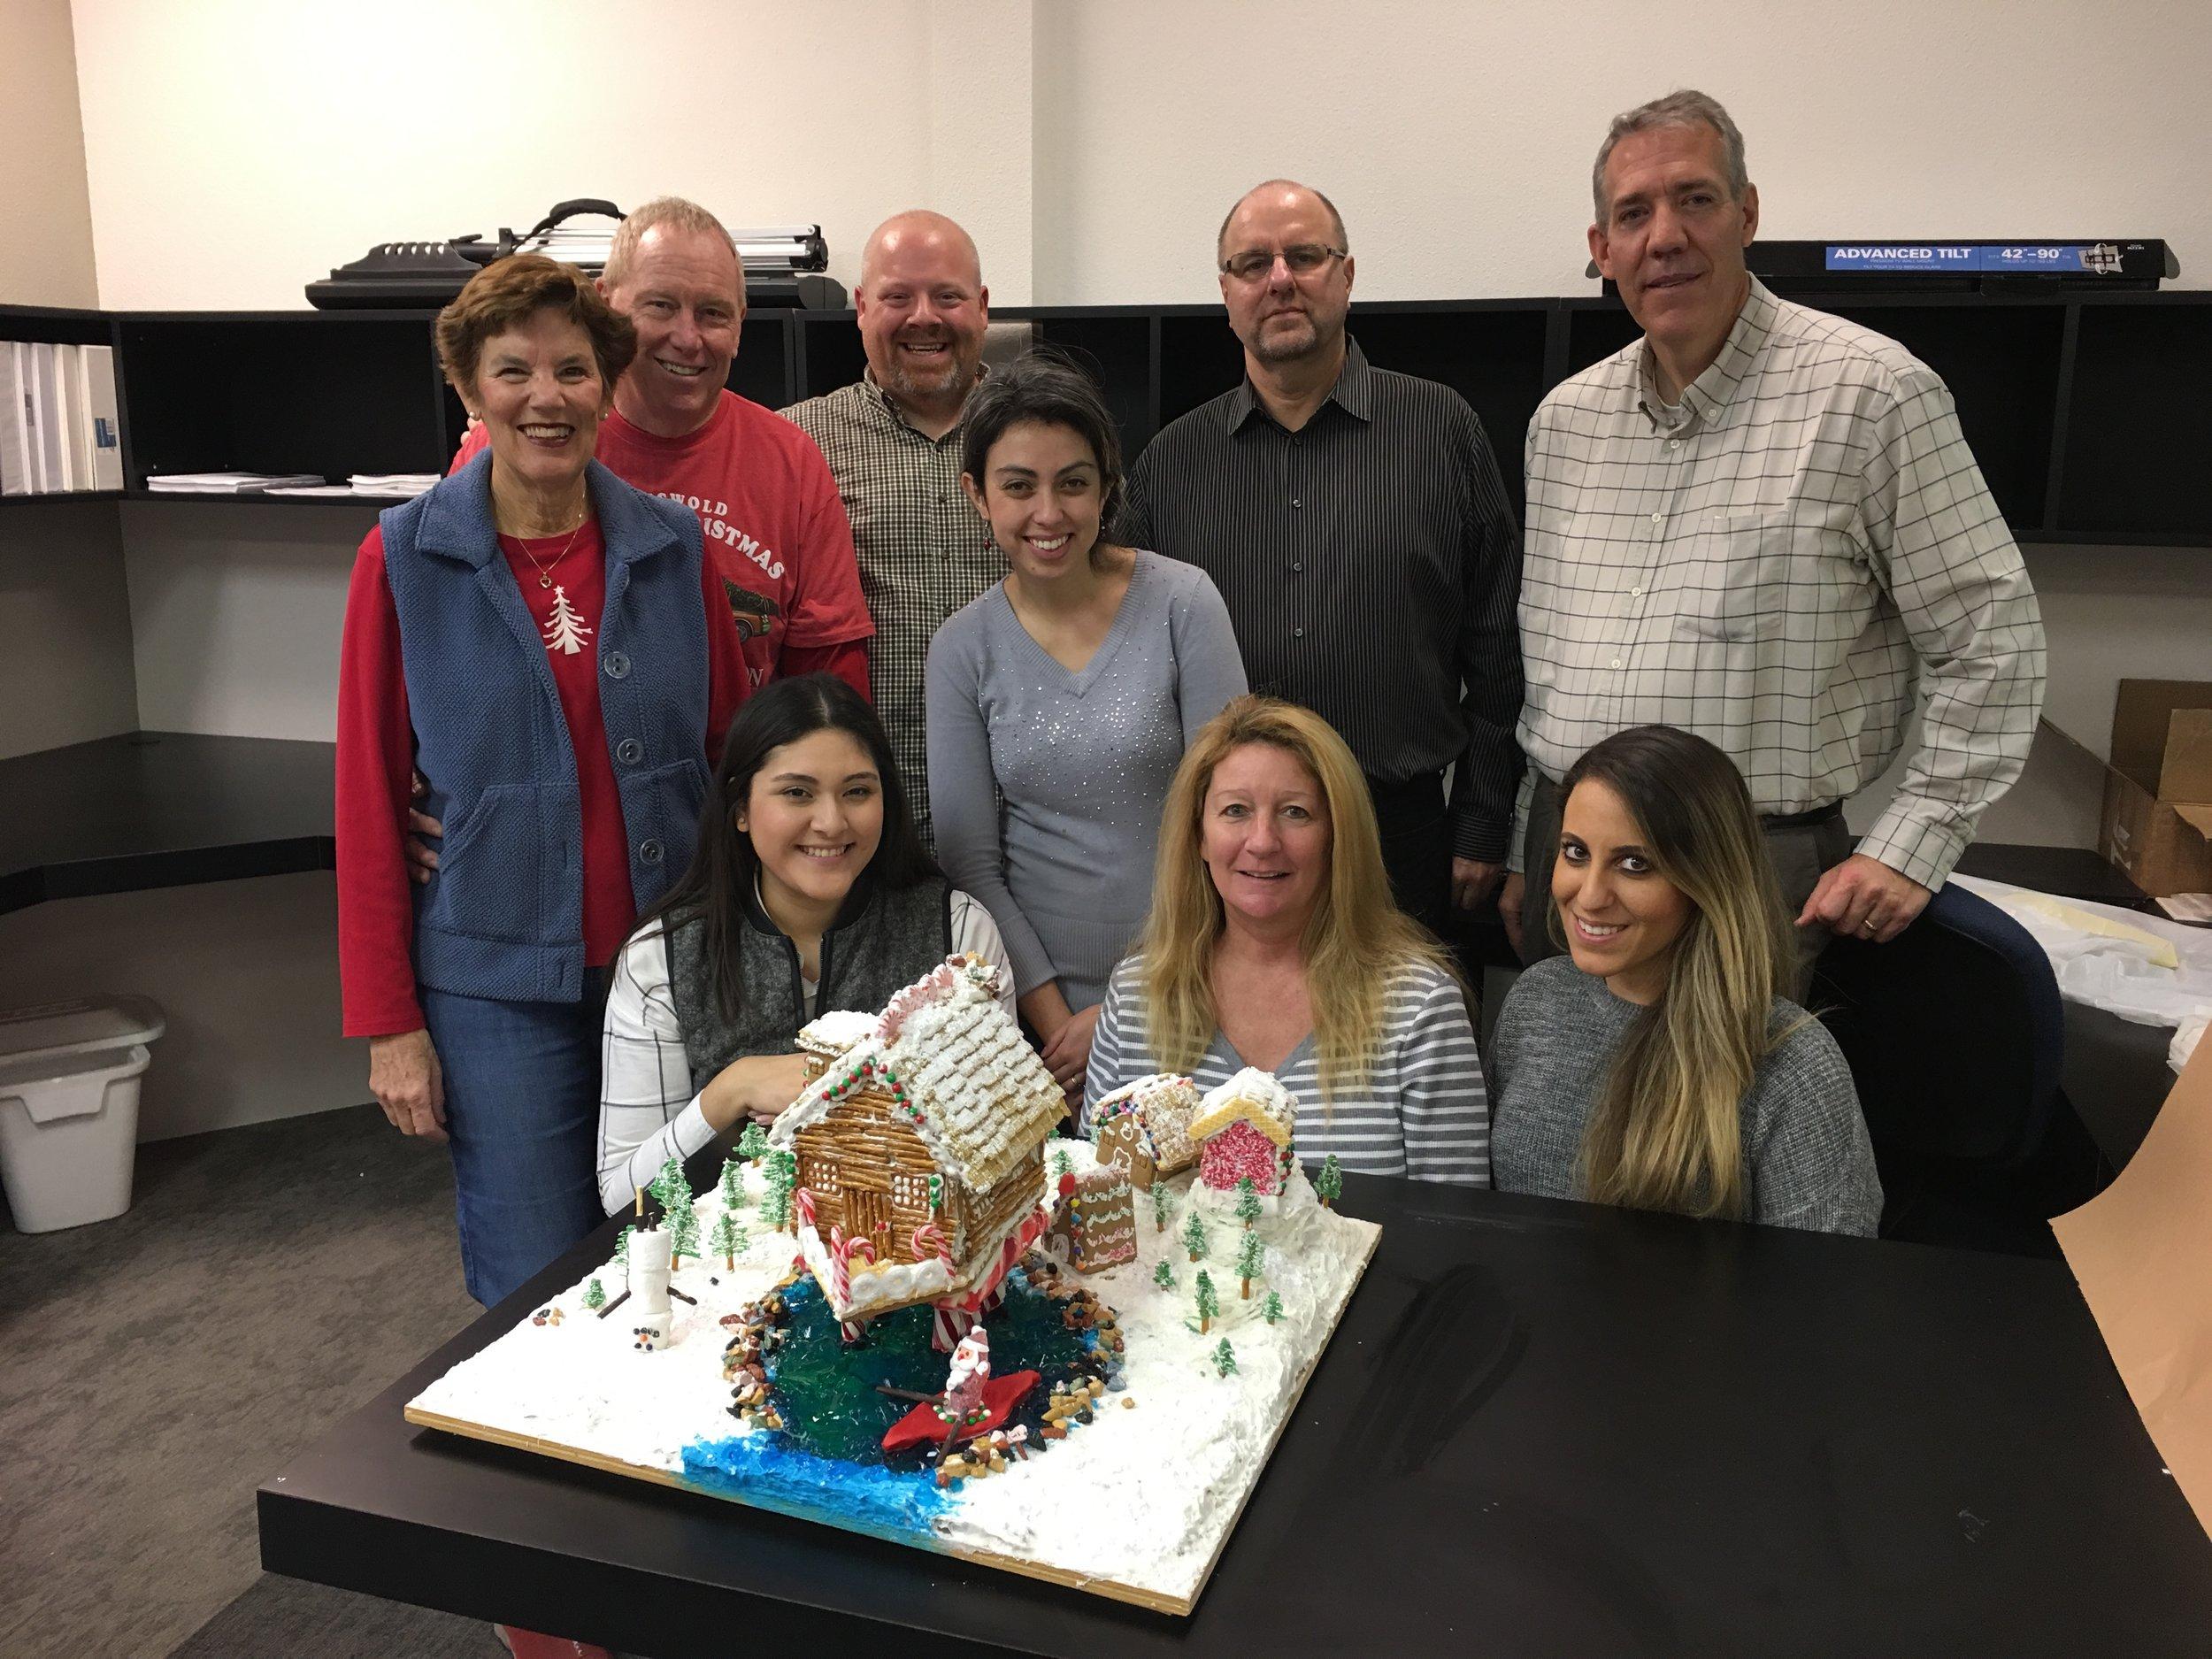 Congratulations on the win Team 2! Rob, Shelley, Shane, Dan, Diane, Paola & Nicole :)